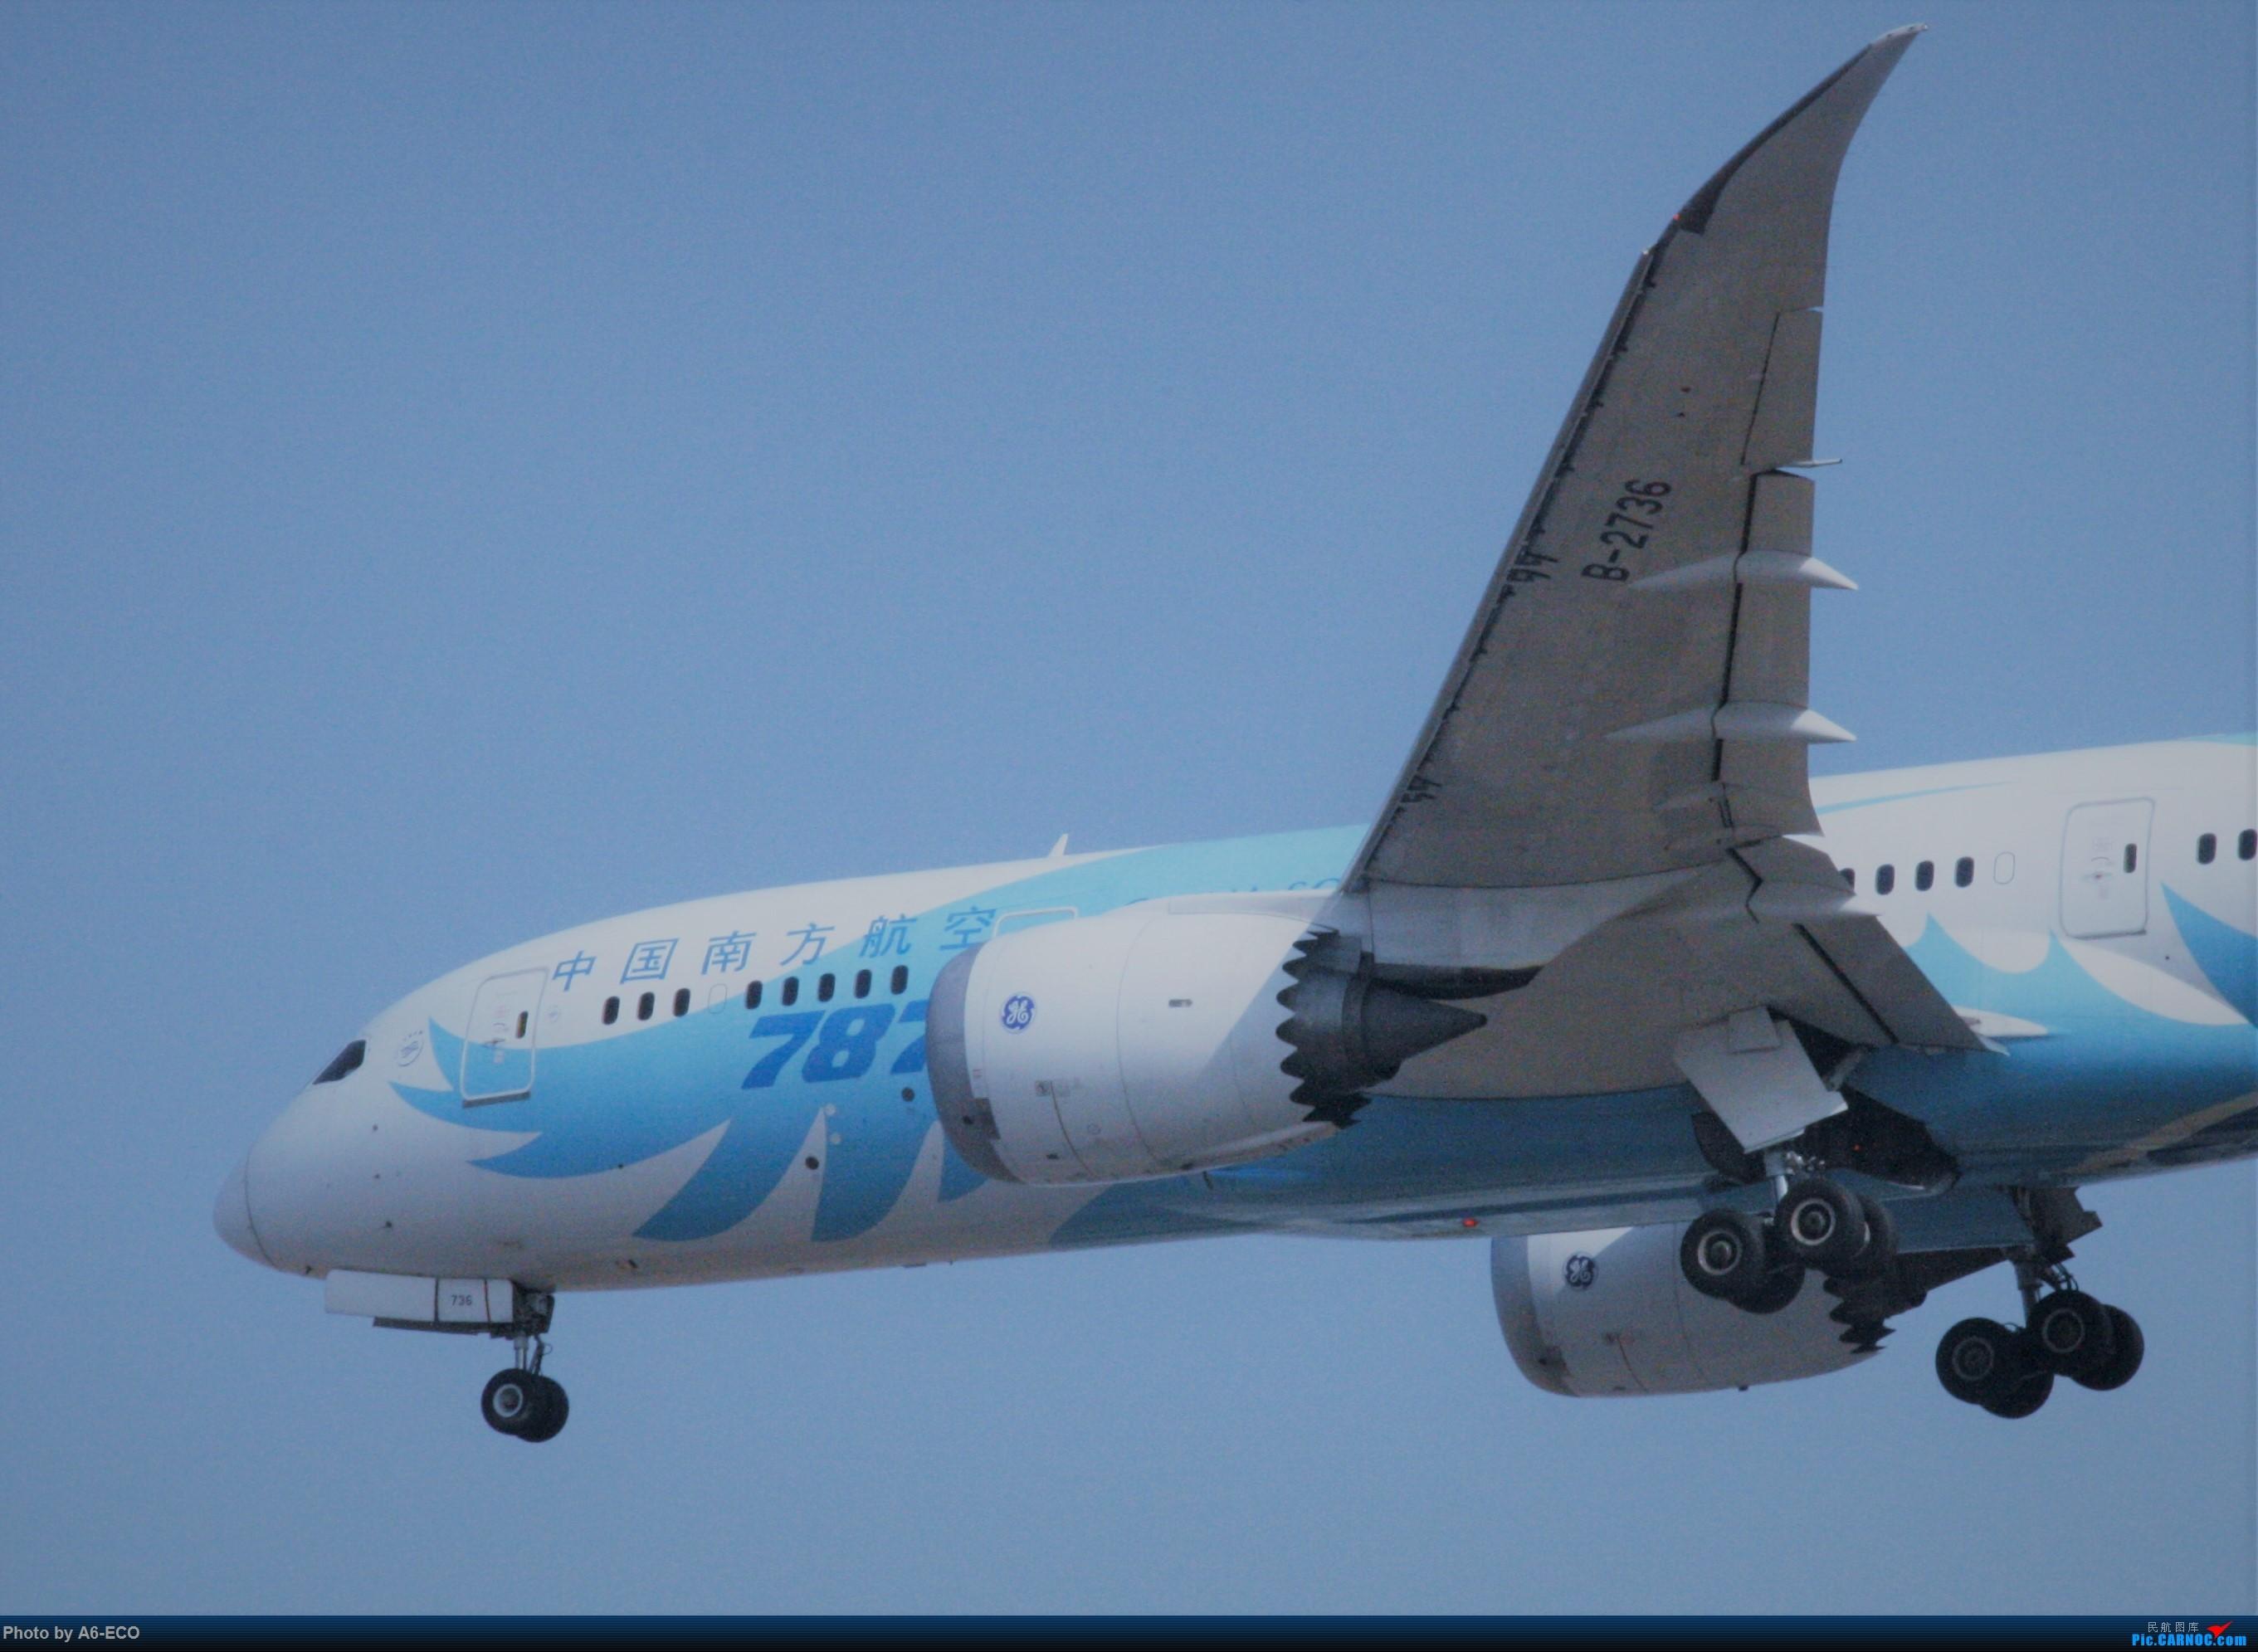 Re:[原创]今天运气极好,云南孔雀,B-1070,2个菜航邮戳,泡菜航彩绘,东航邮戳...... BOEING 787-8 B-2736 中国北京首都国际机场